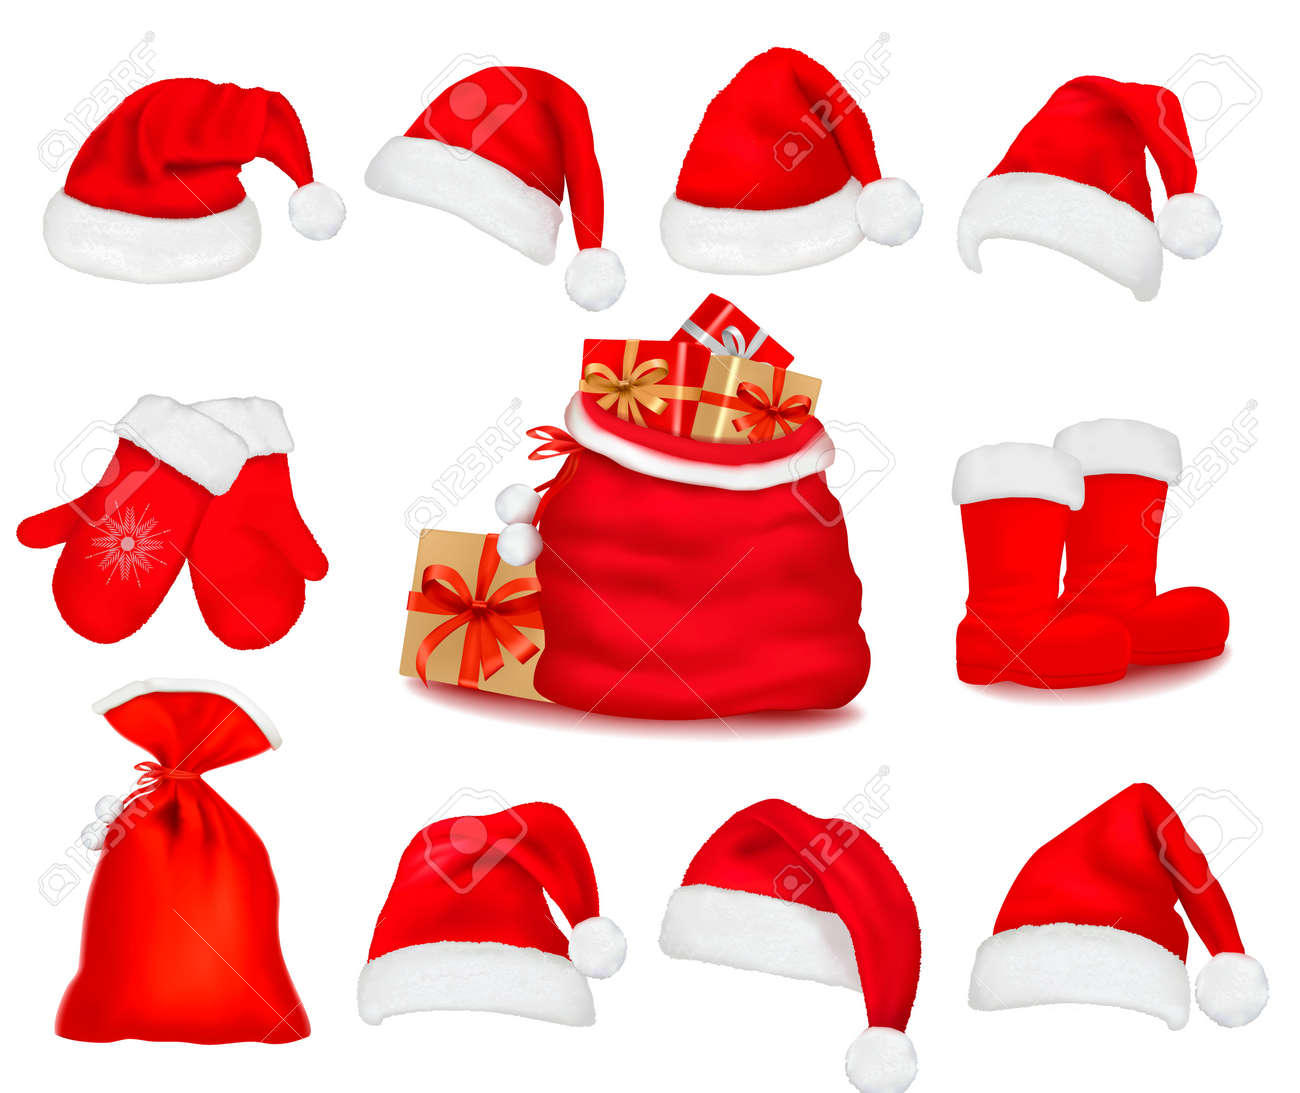 Big set of red santa hats and clothes and a gift bag. Vector illustration. - 11475984